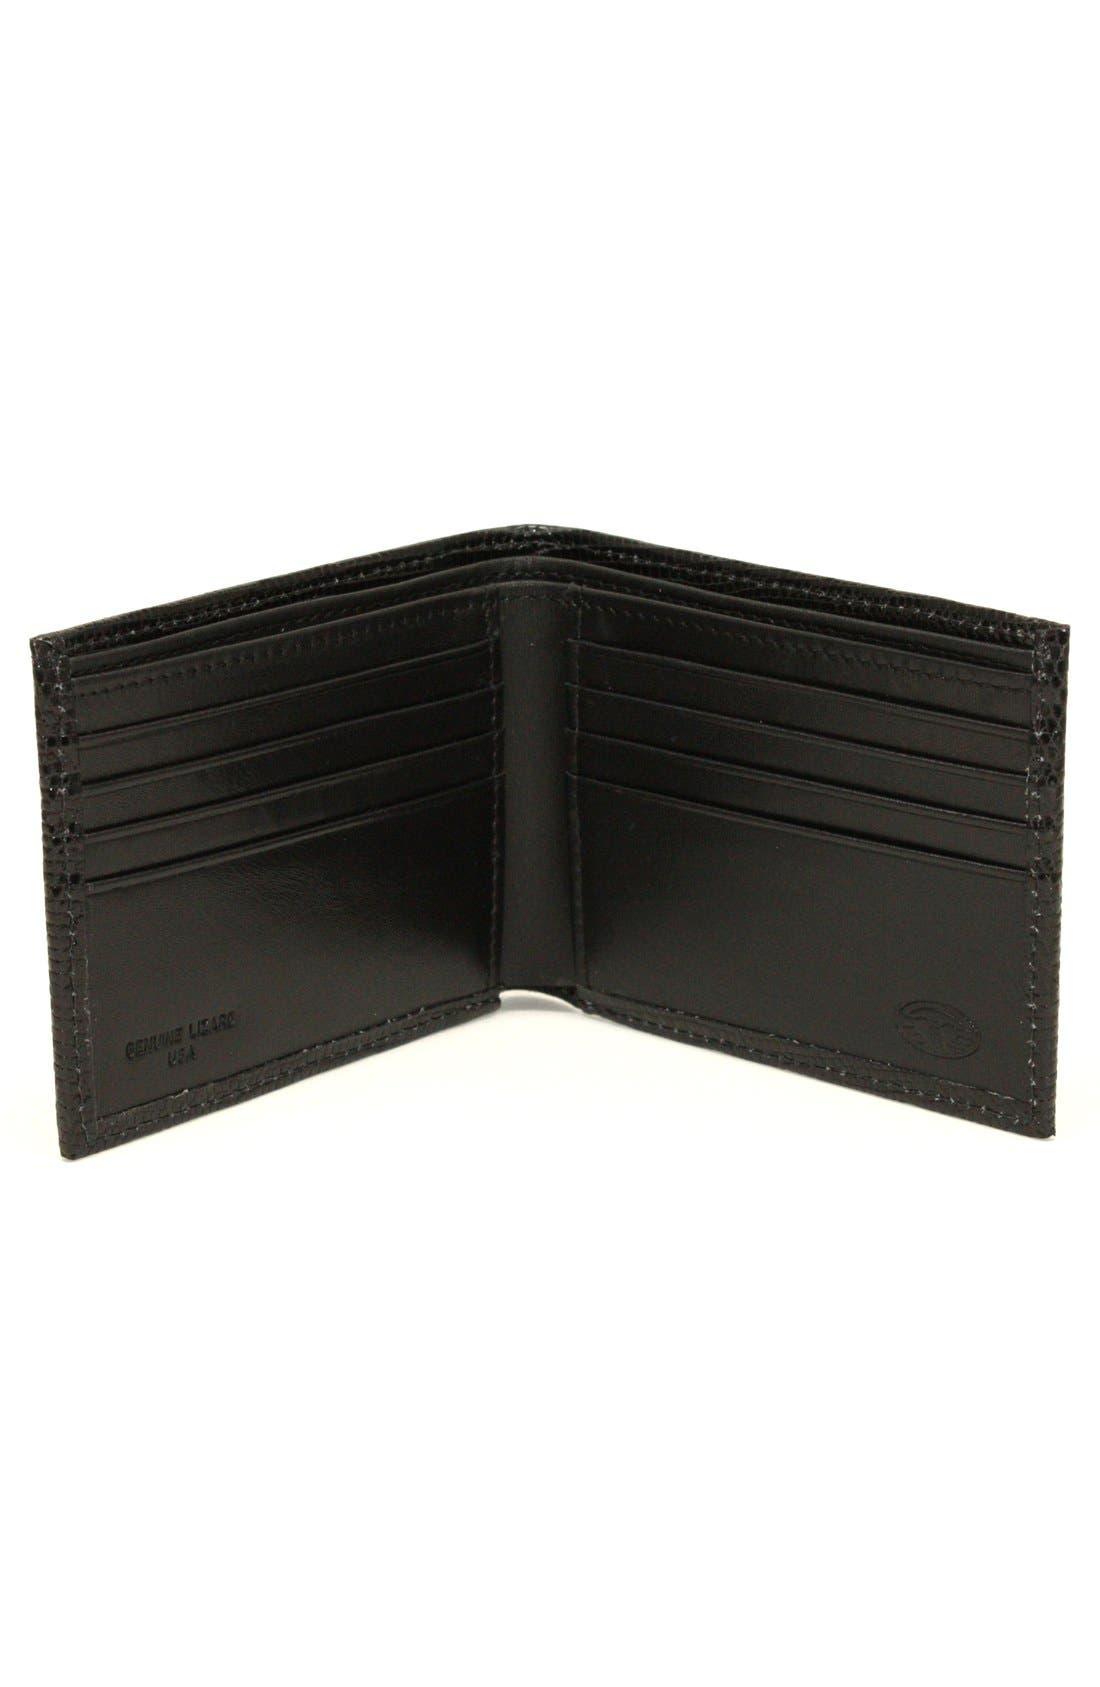 Alternate Image 2  - Torino Belts Genuine Lizard Wallet